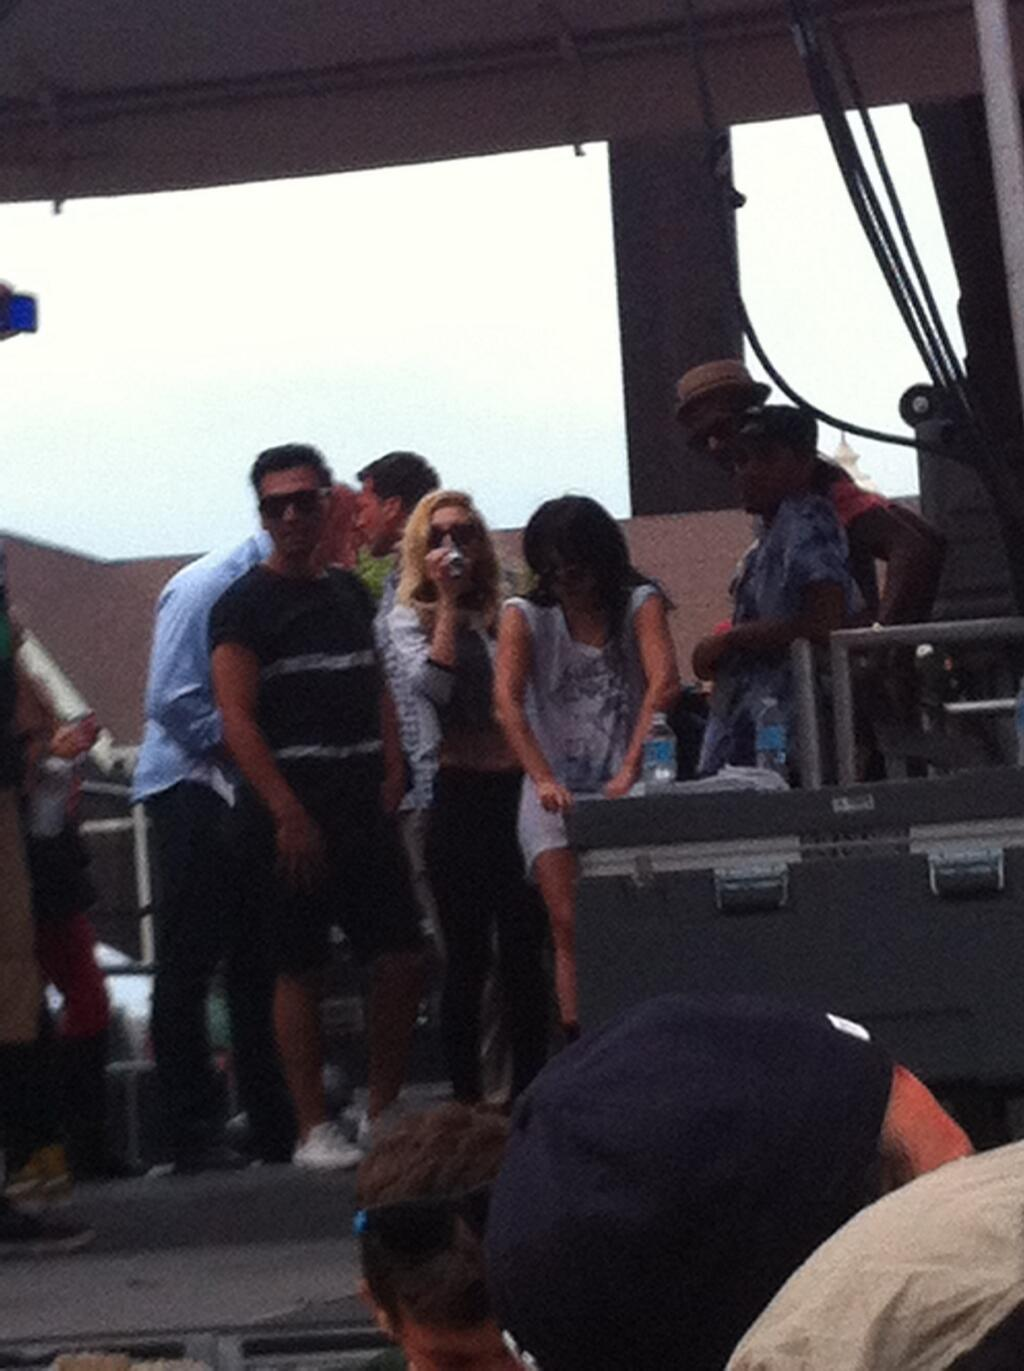 Gaga at Pitchfork Music Festival (July 21)